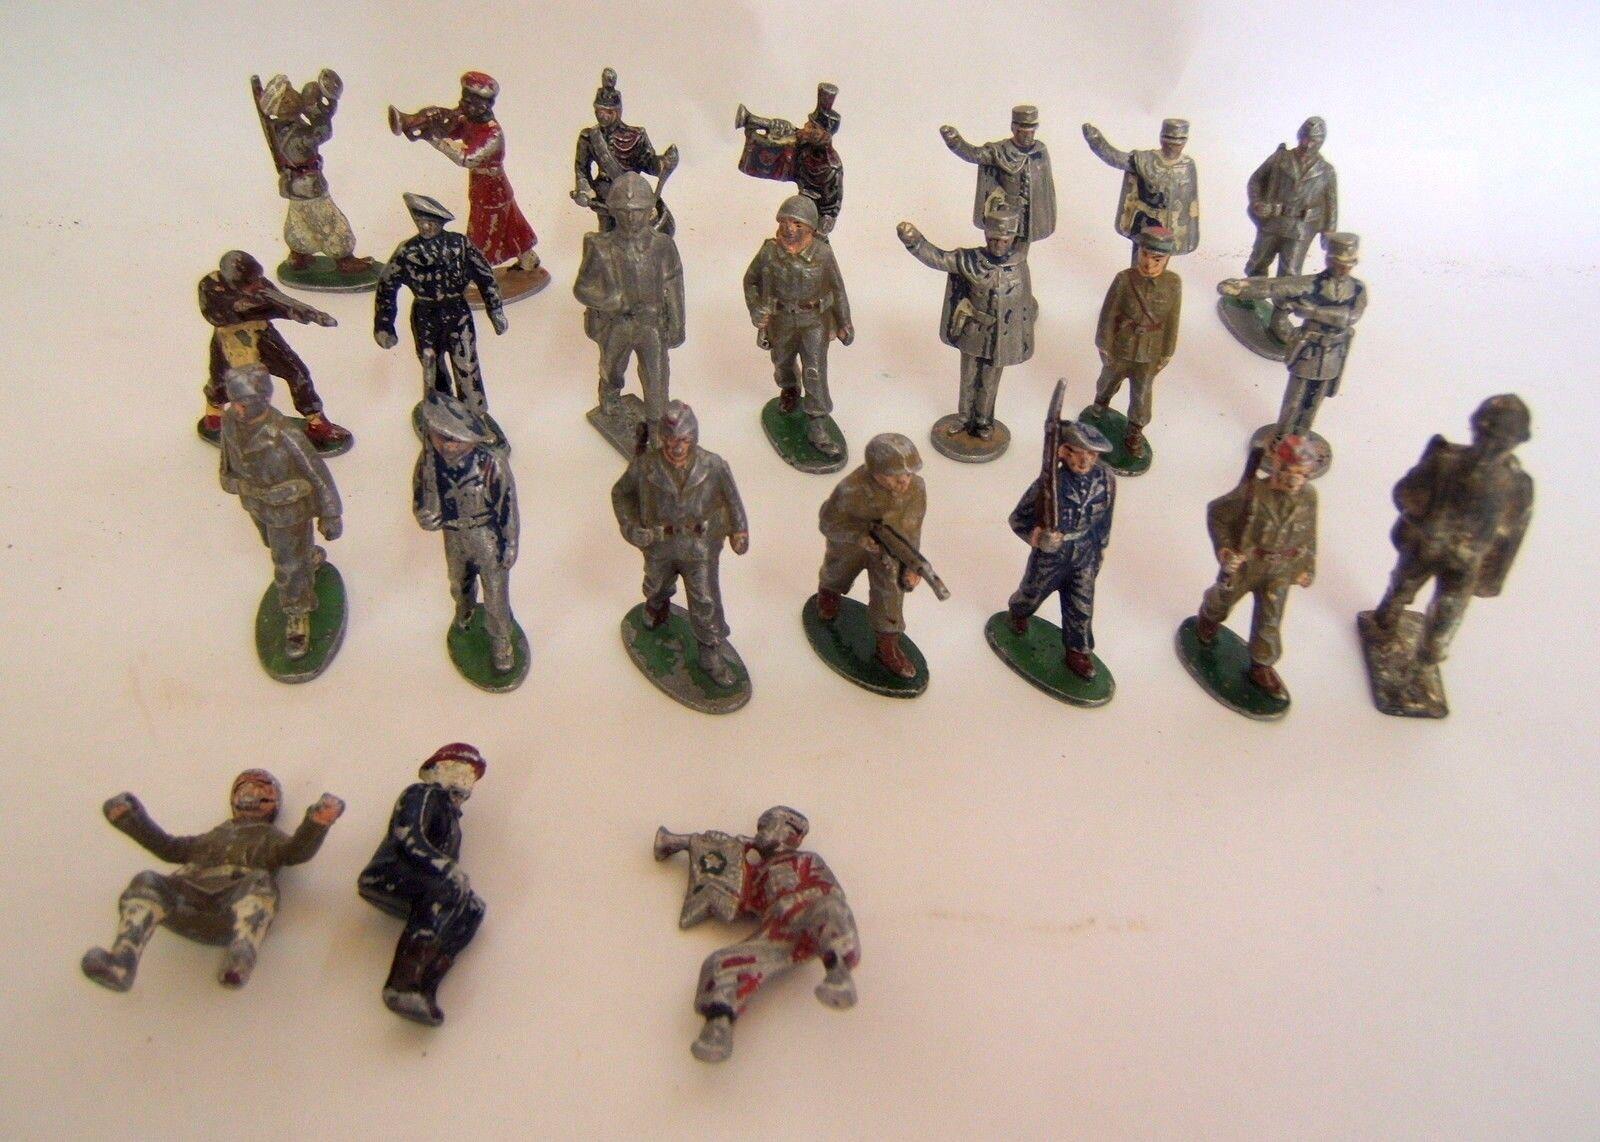 24 Stück Packung Petit Soldat Quiralu Spielzeug Antik